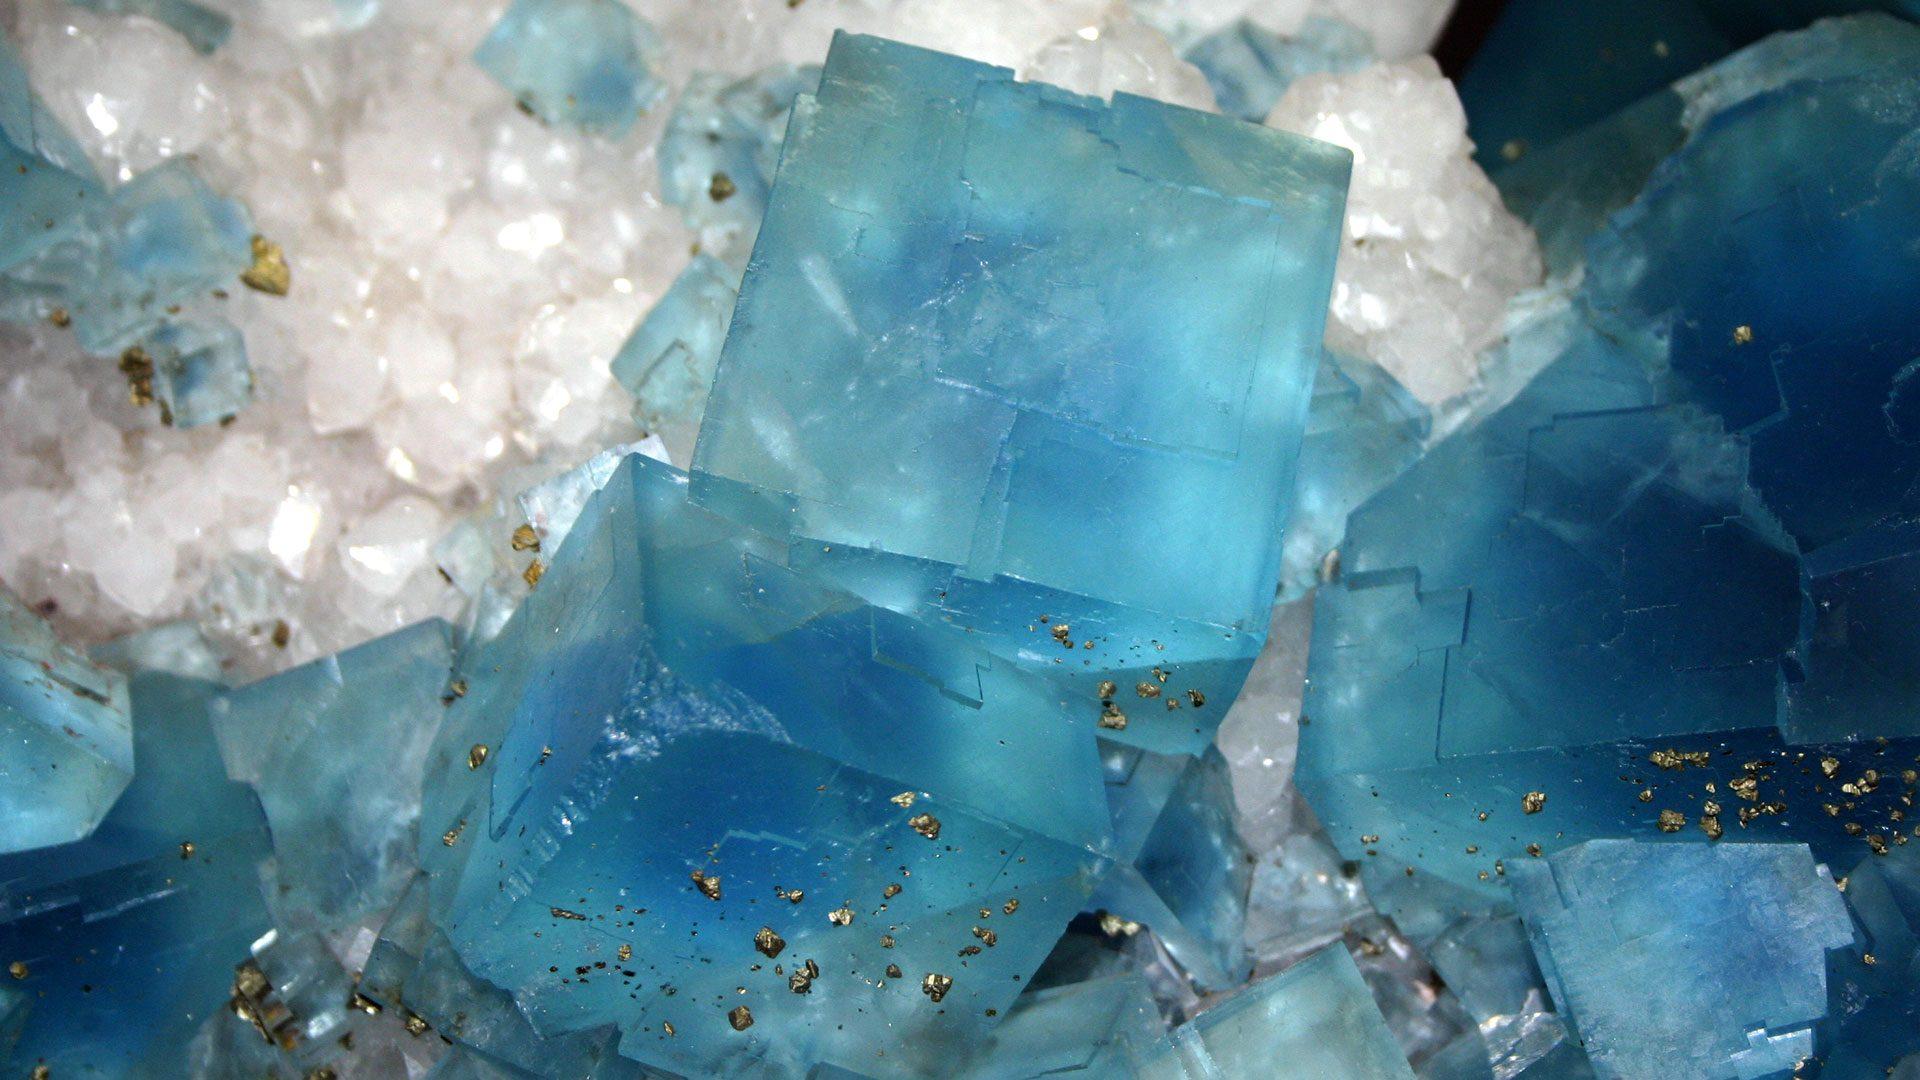 Terminated Blue Fluorite Crystal Specimen - Mineral Specimen - Photograph by Giovanni Dall'Orto